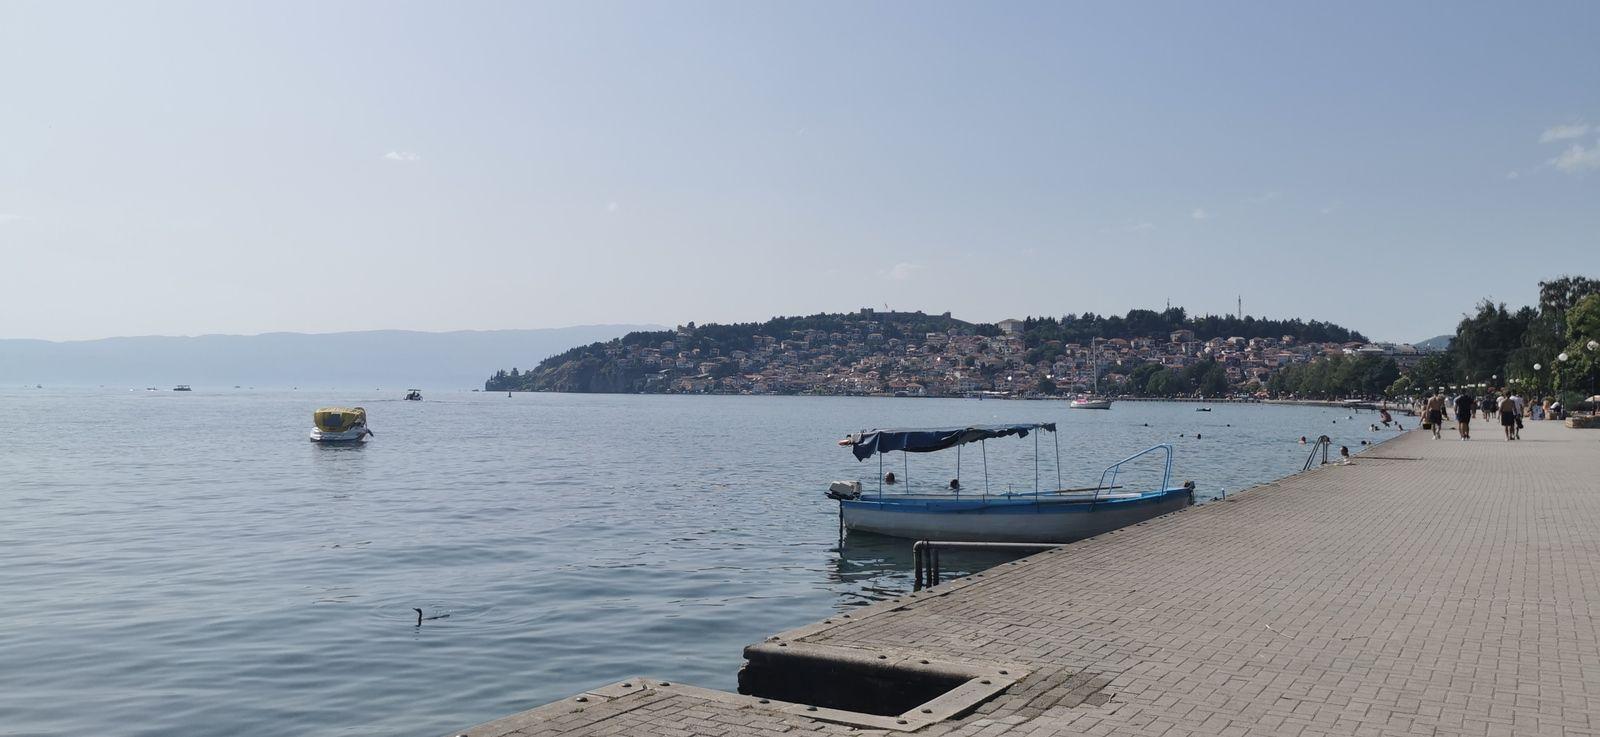 Dimanche 1er août : direction Ohrid